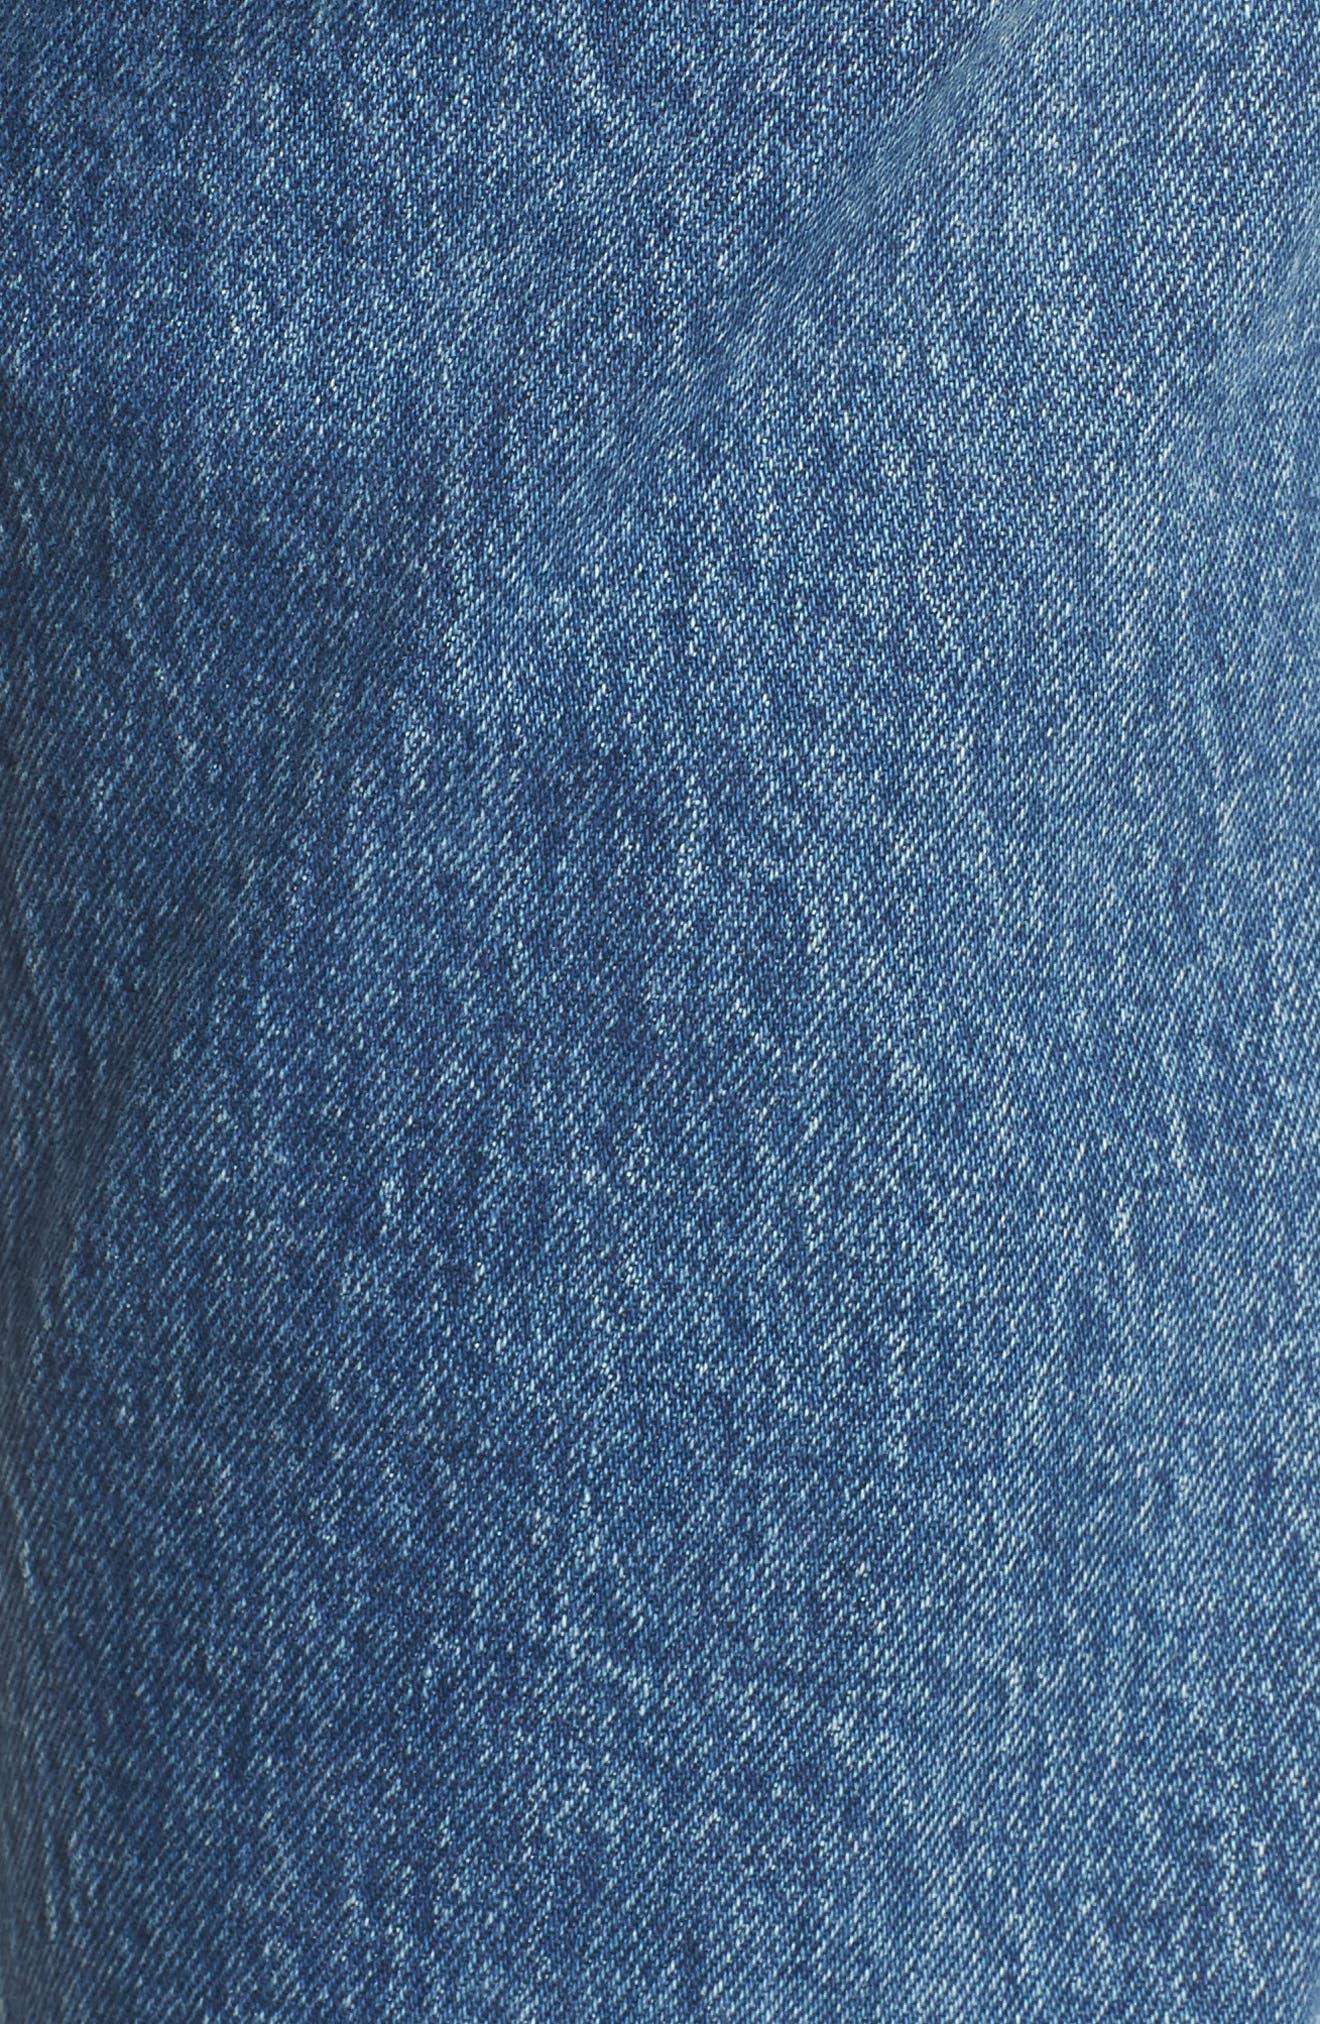 Wedgie Raw Hem High Waist Straight Leg Jeans,                             Alternate thumbnail 6, color,                             LOVE TRIANGLE